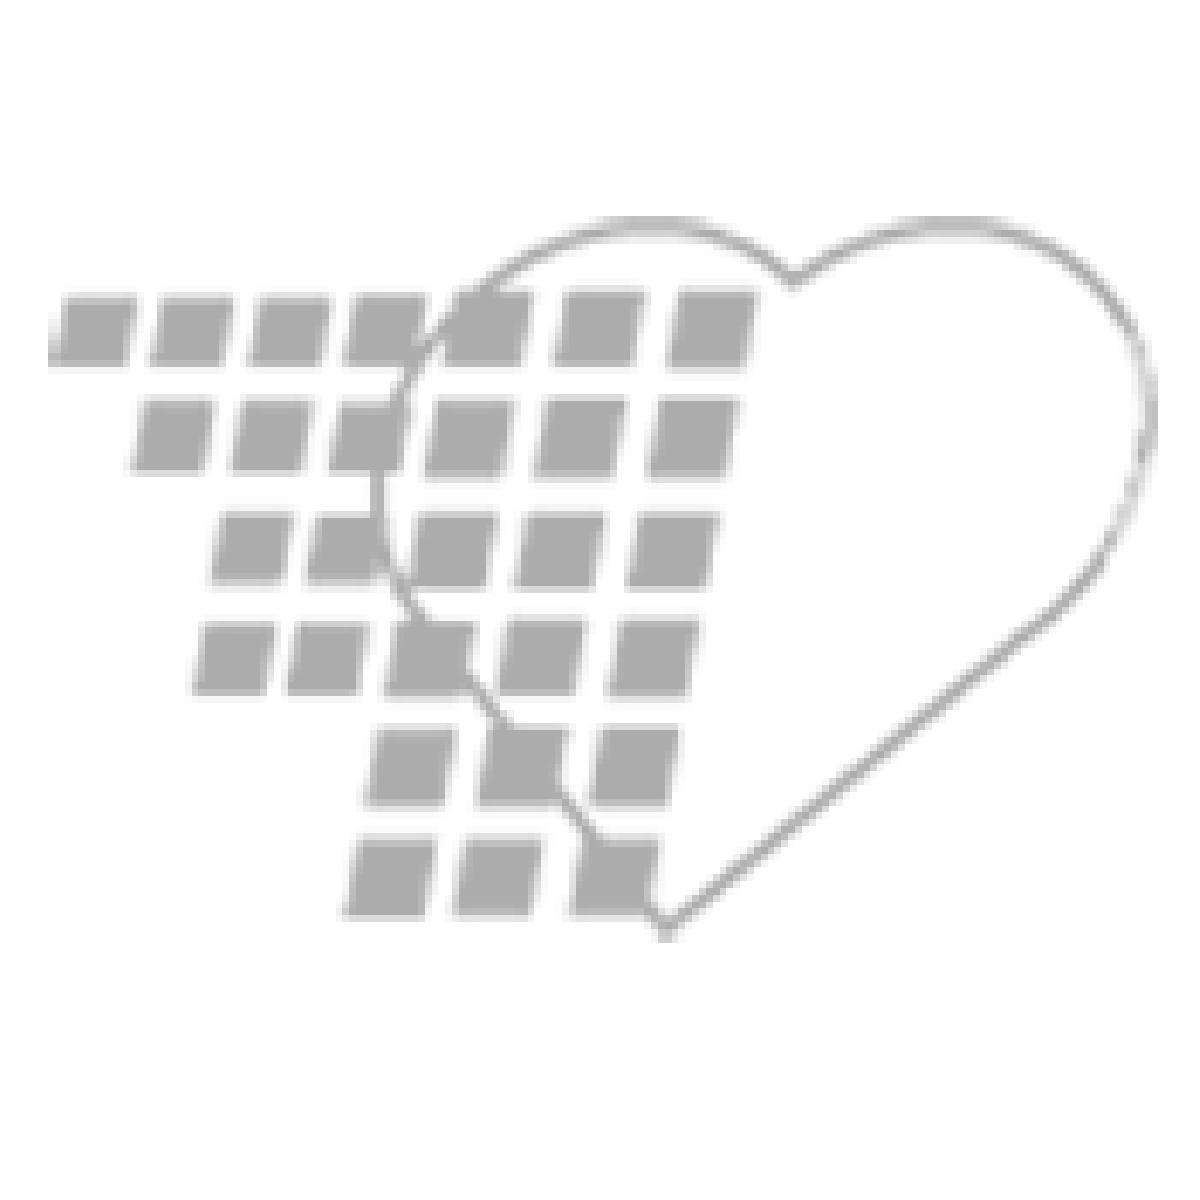 06-54-8110-REFURB Refurbished Alaris Medley 8110 Syringe Pump